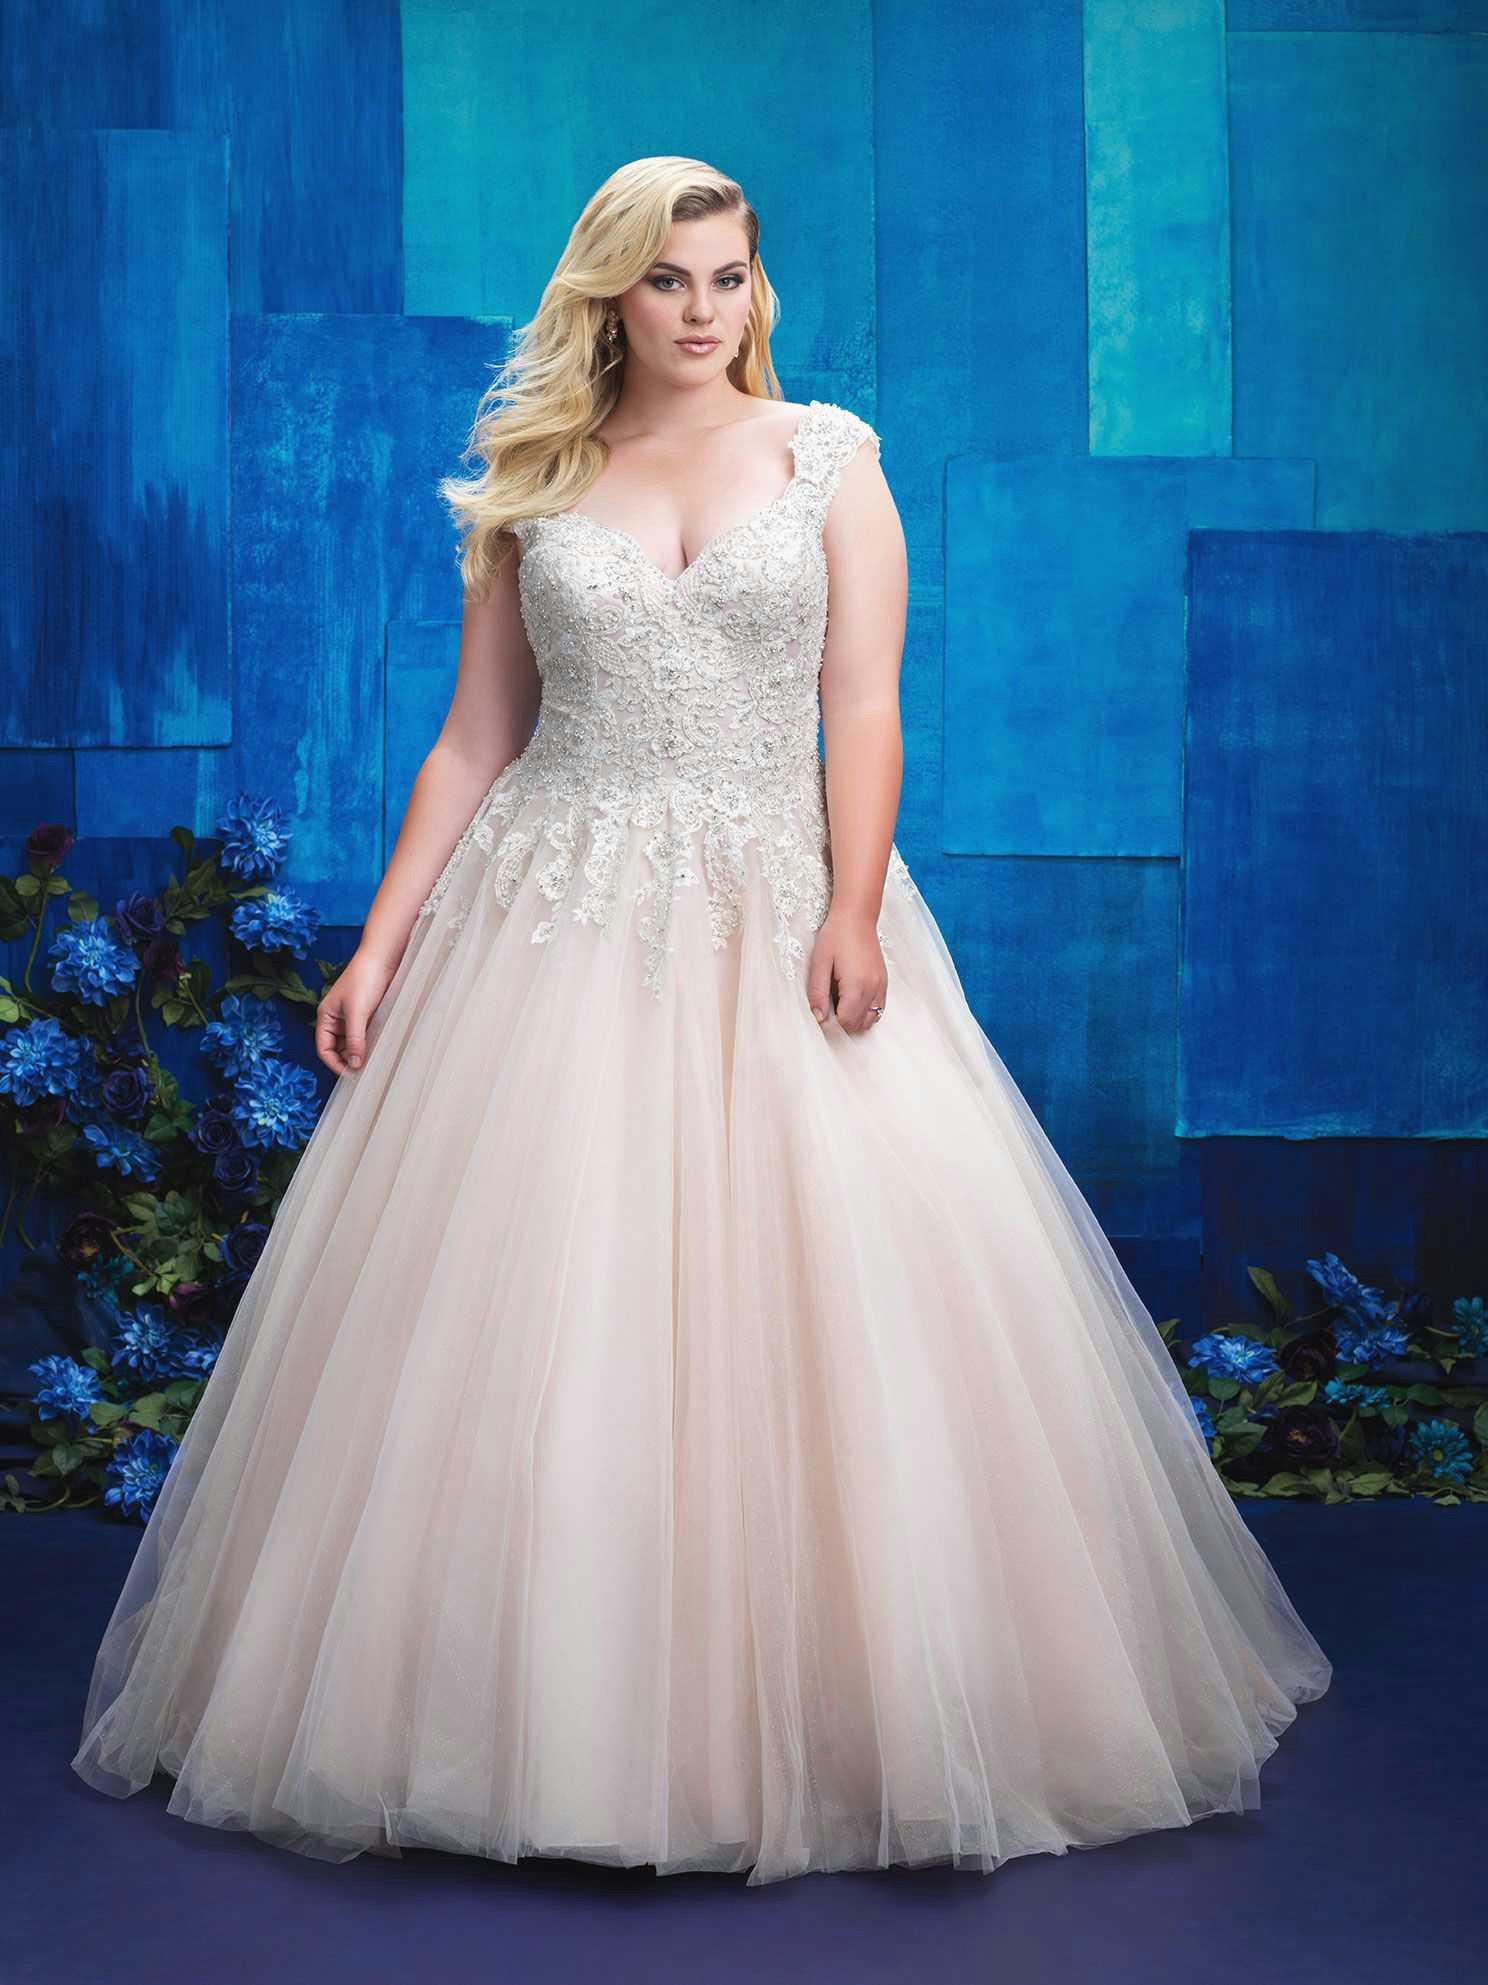 fresh short lace wedding dress with sleeves 0d e0b2eb07d0820fa e2b4